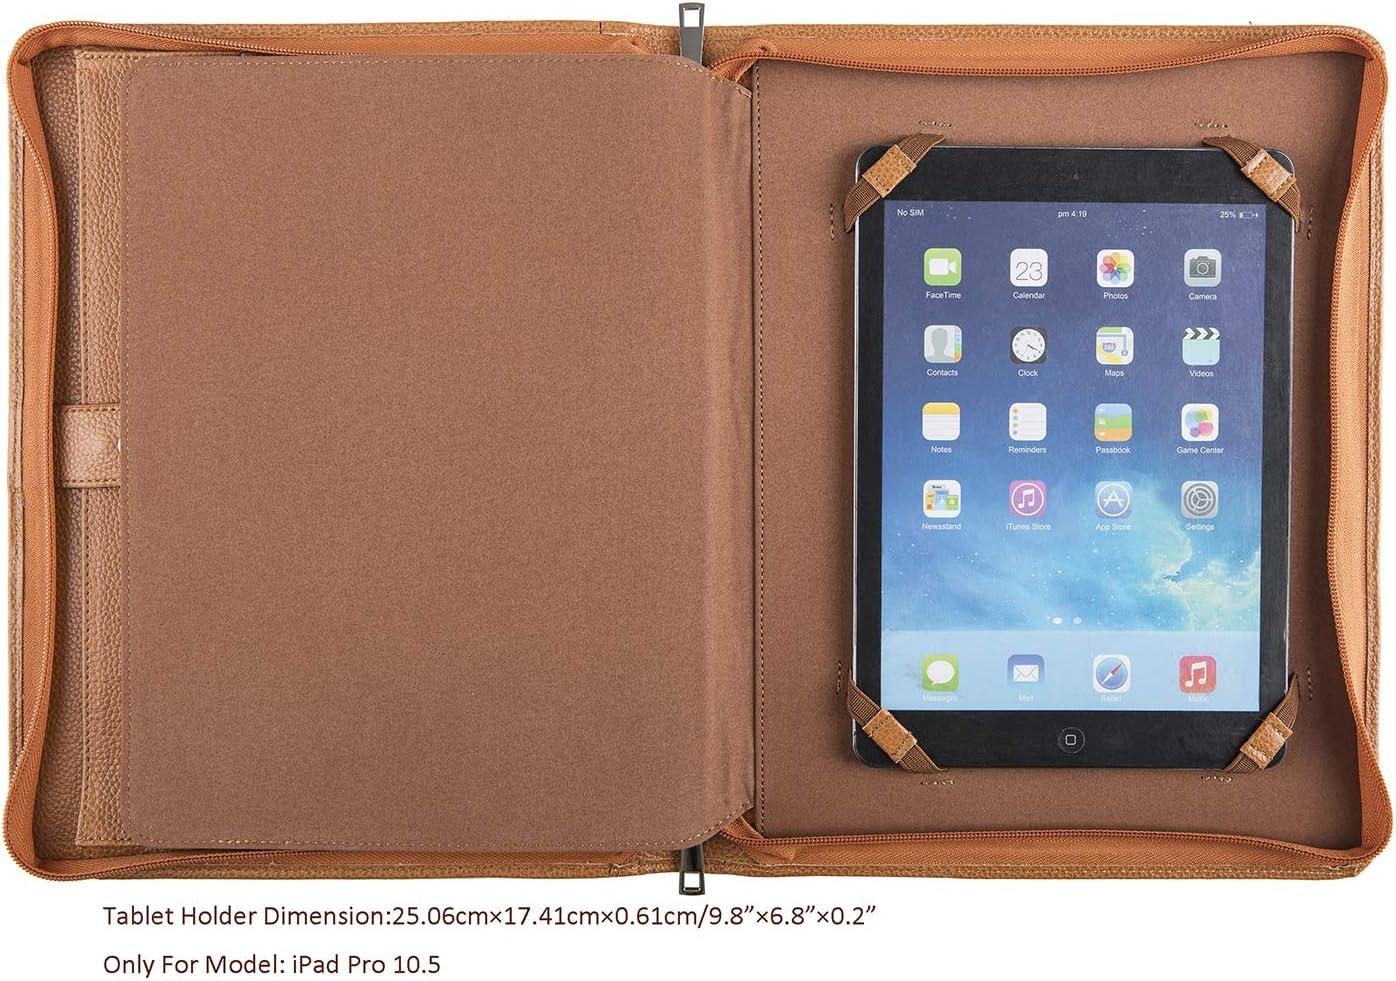 A4 Size Portfolio Padfolio Case,Business Organizer,A4 Document Folder,Black Cohokori Handmade Genuine Leather Conference Folder Zipped for iPad Pro 12.9 2018 3rd Gen